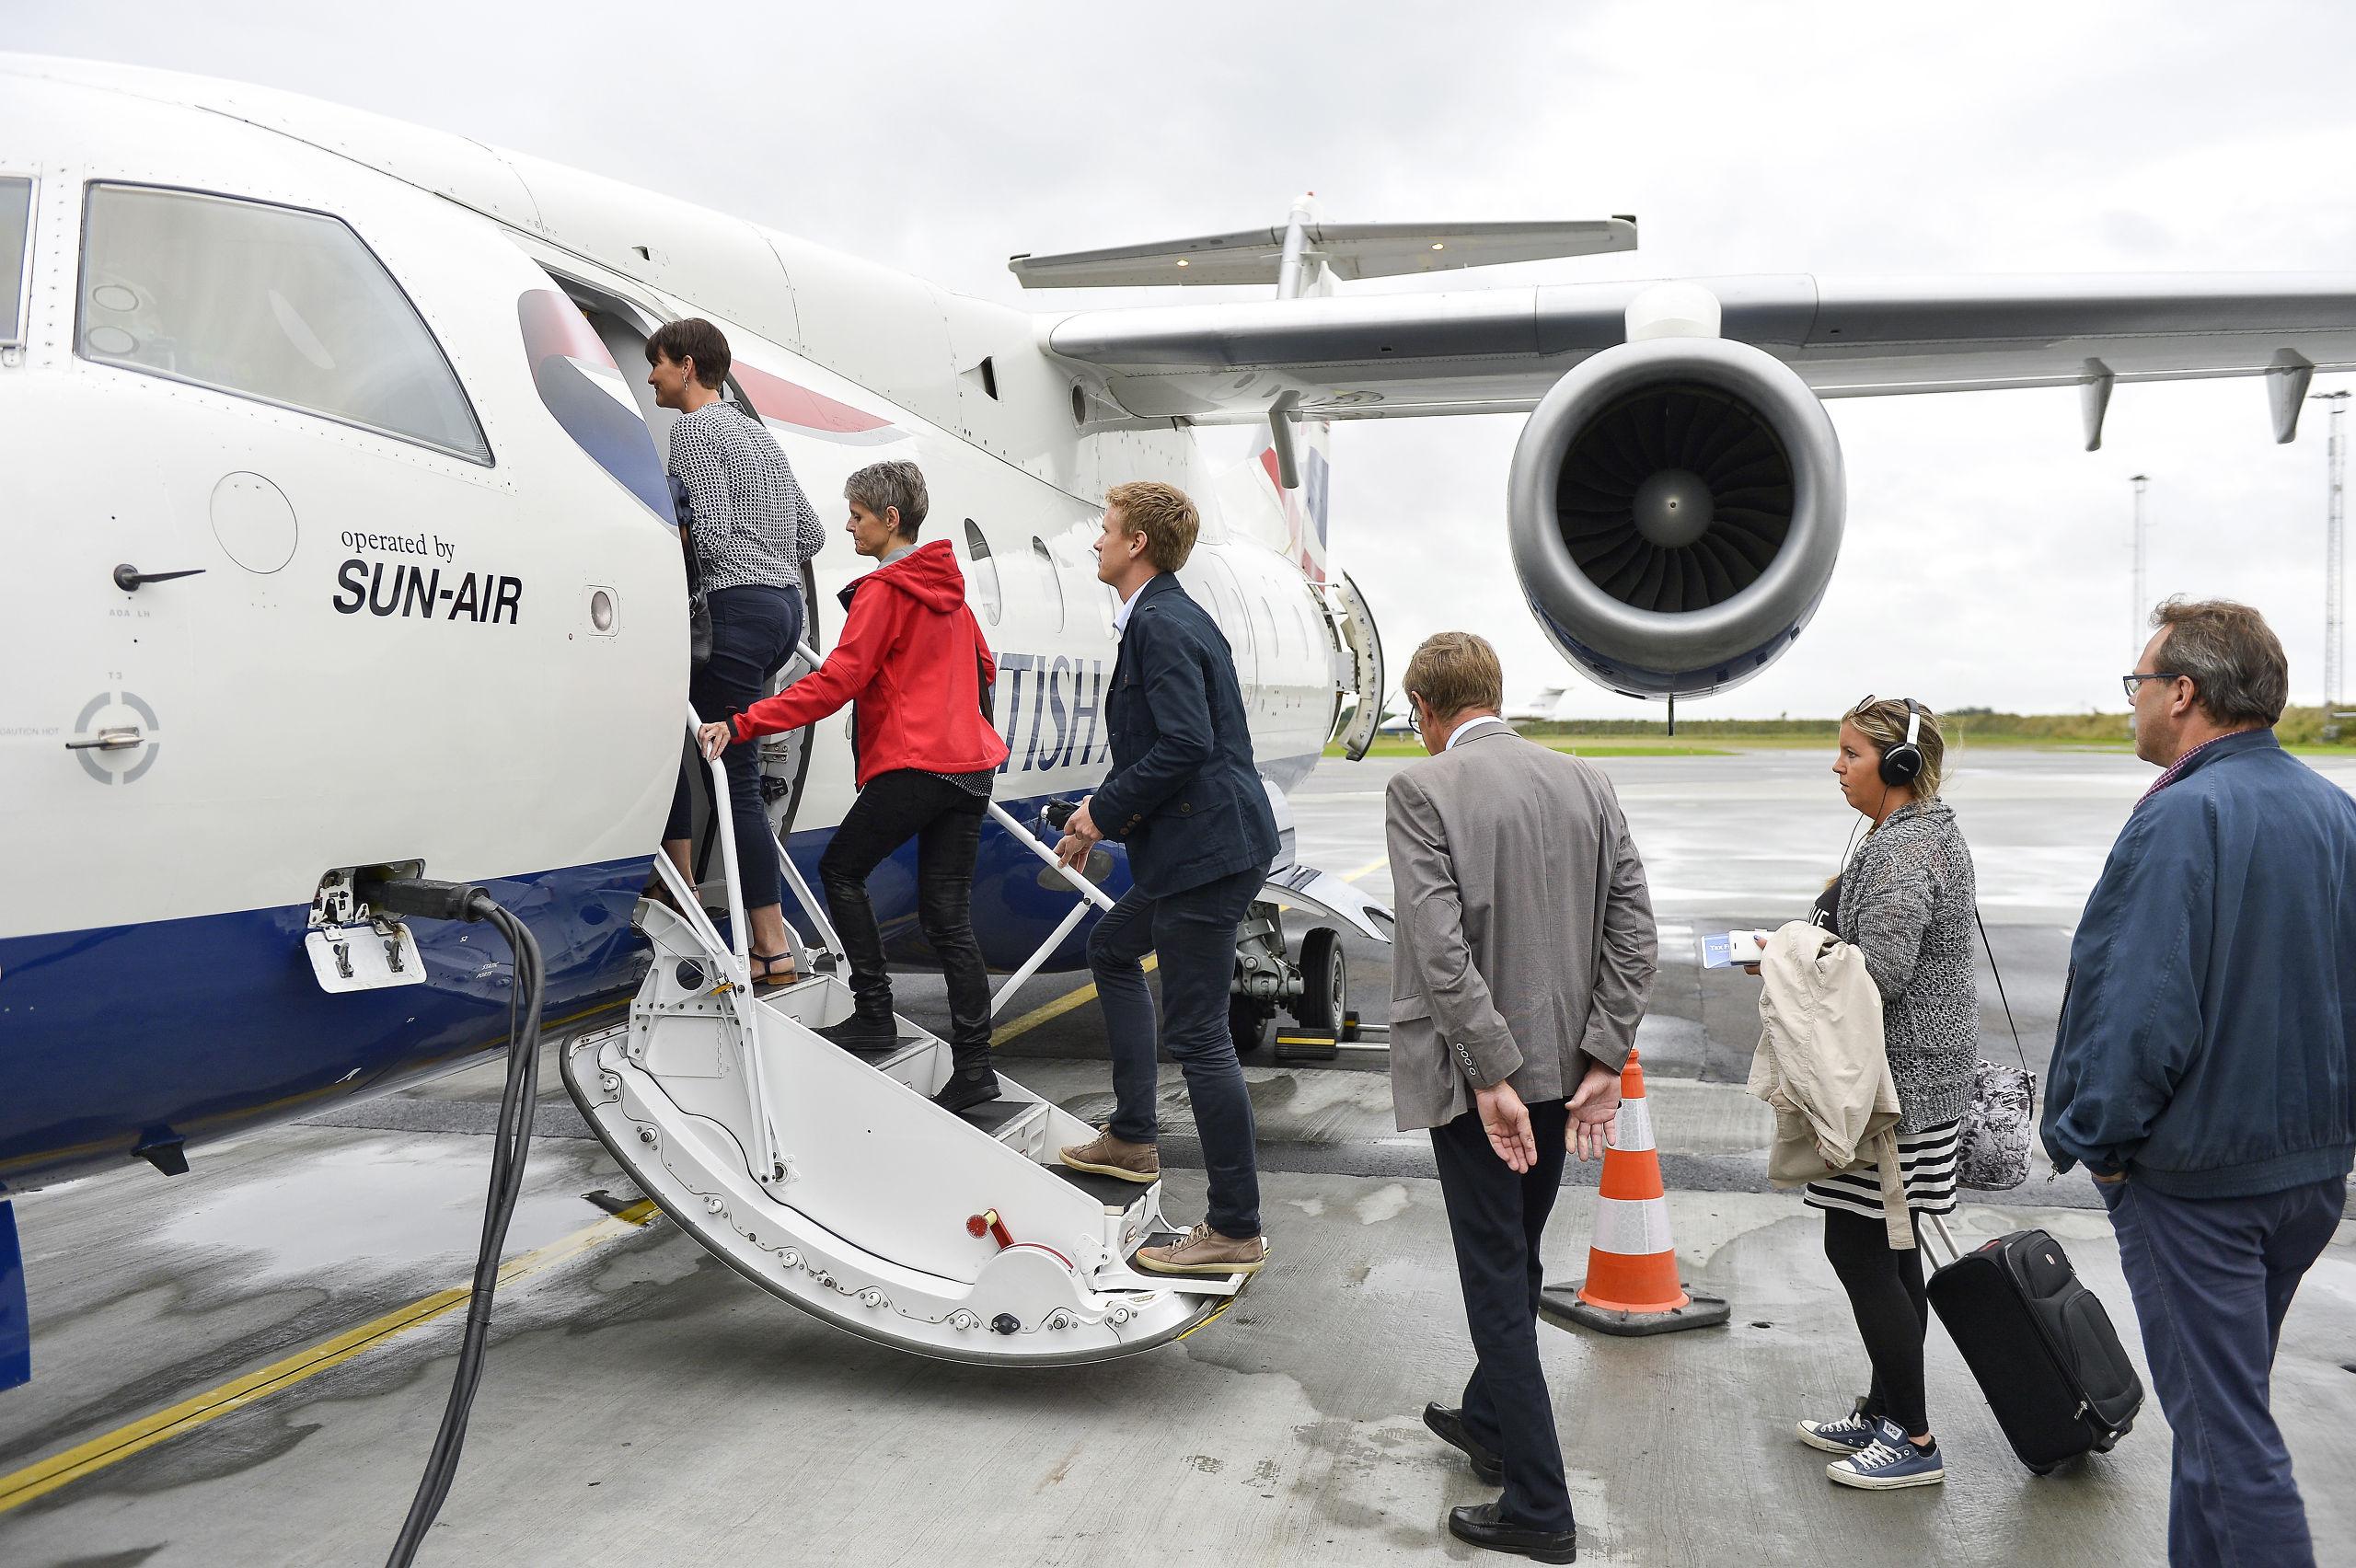 Det er slut med at gå ombord på Sun-Airs maskine til Oslo - selskabet har netop opgivet den direkte rute fra Aalborg . Arkivfoto